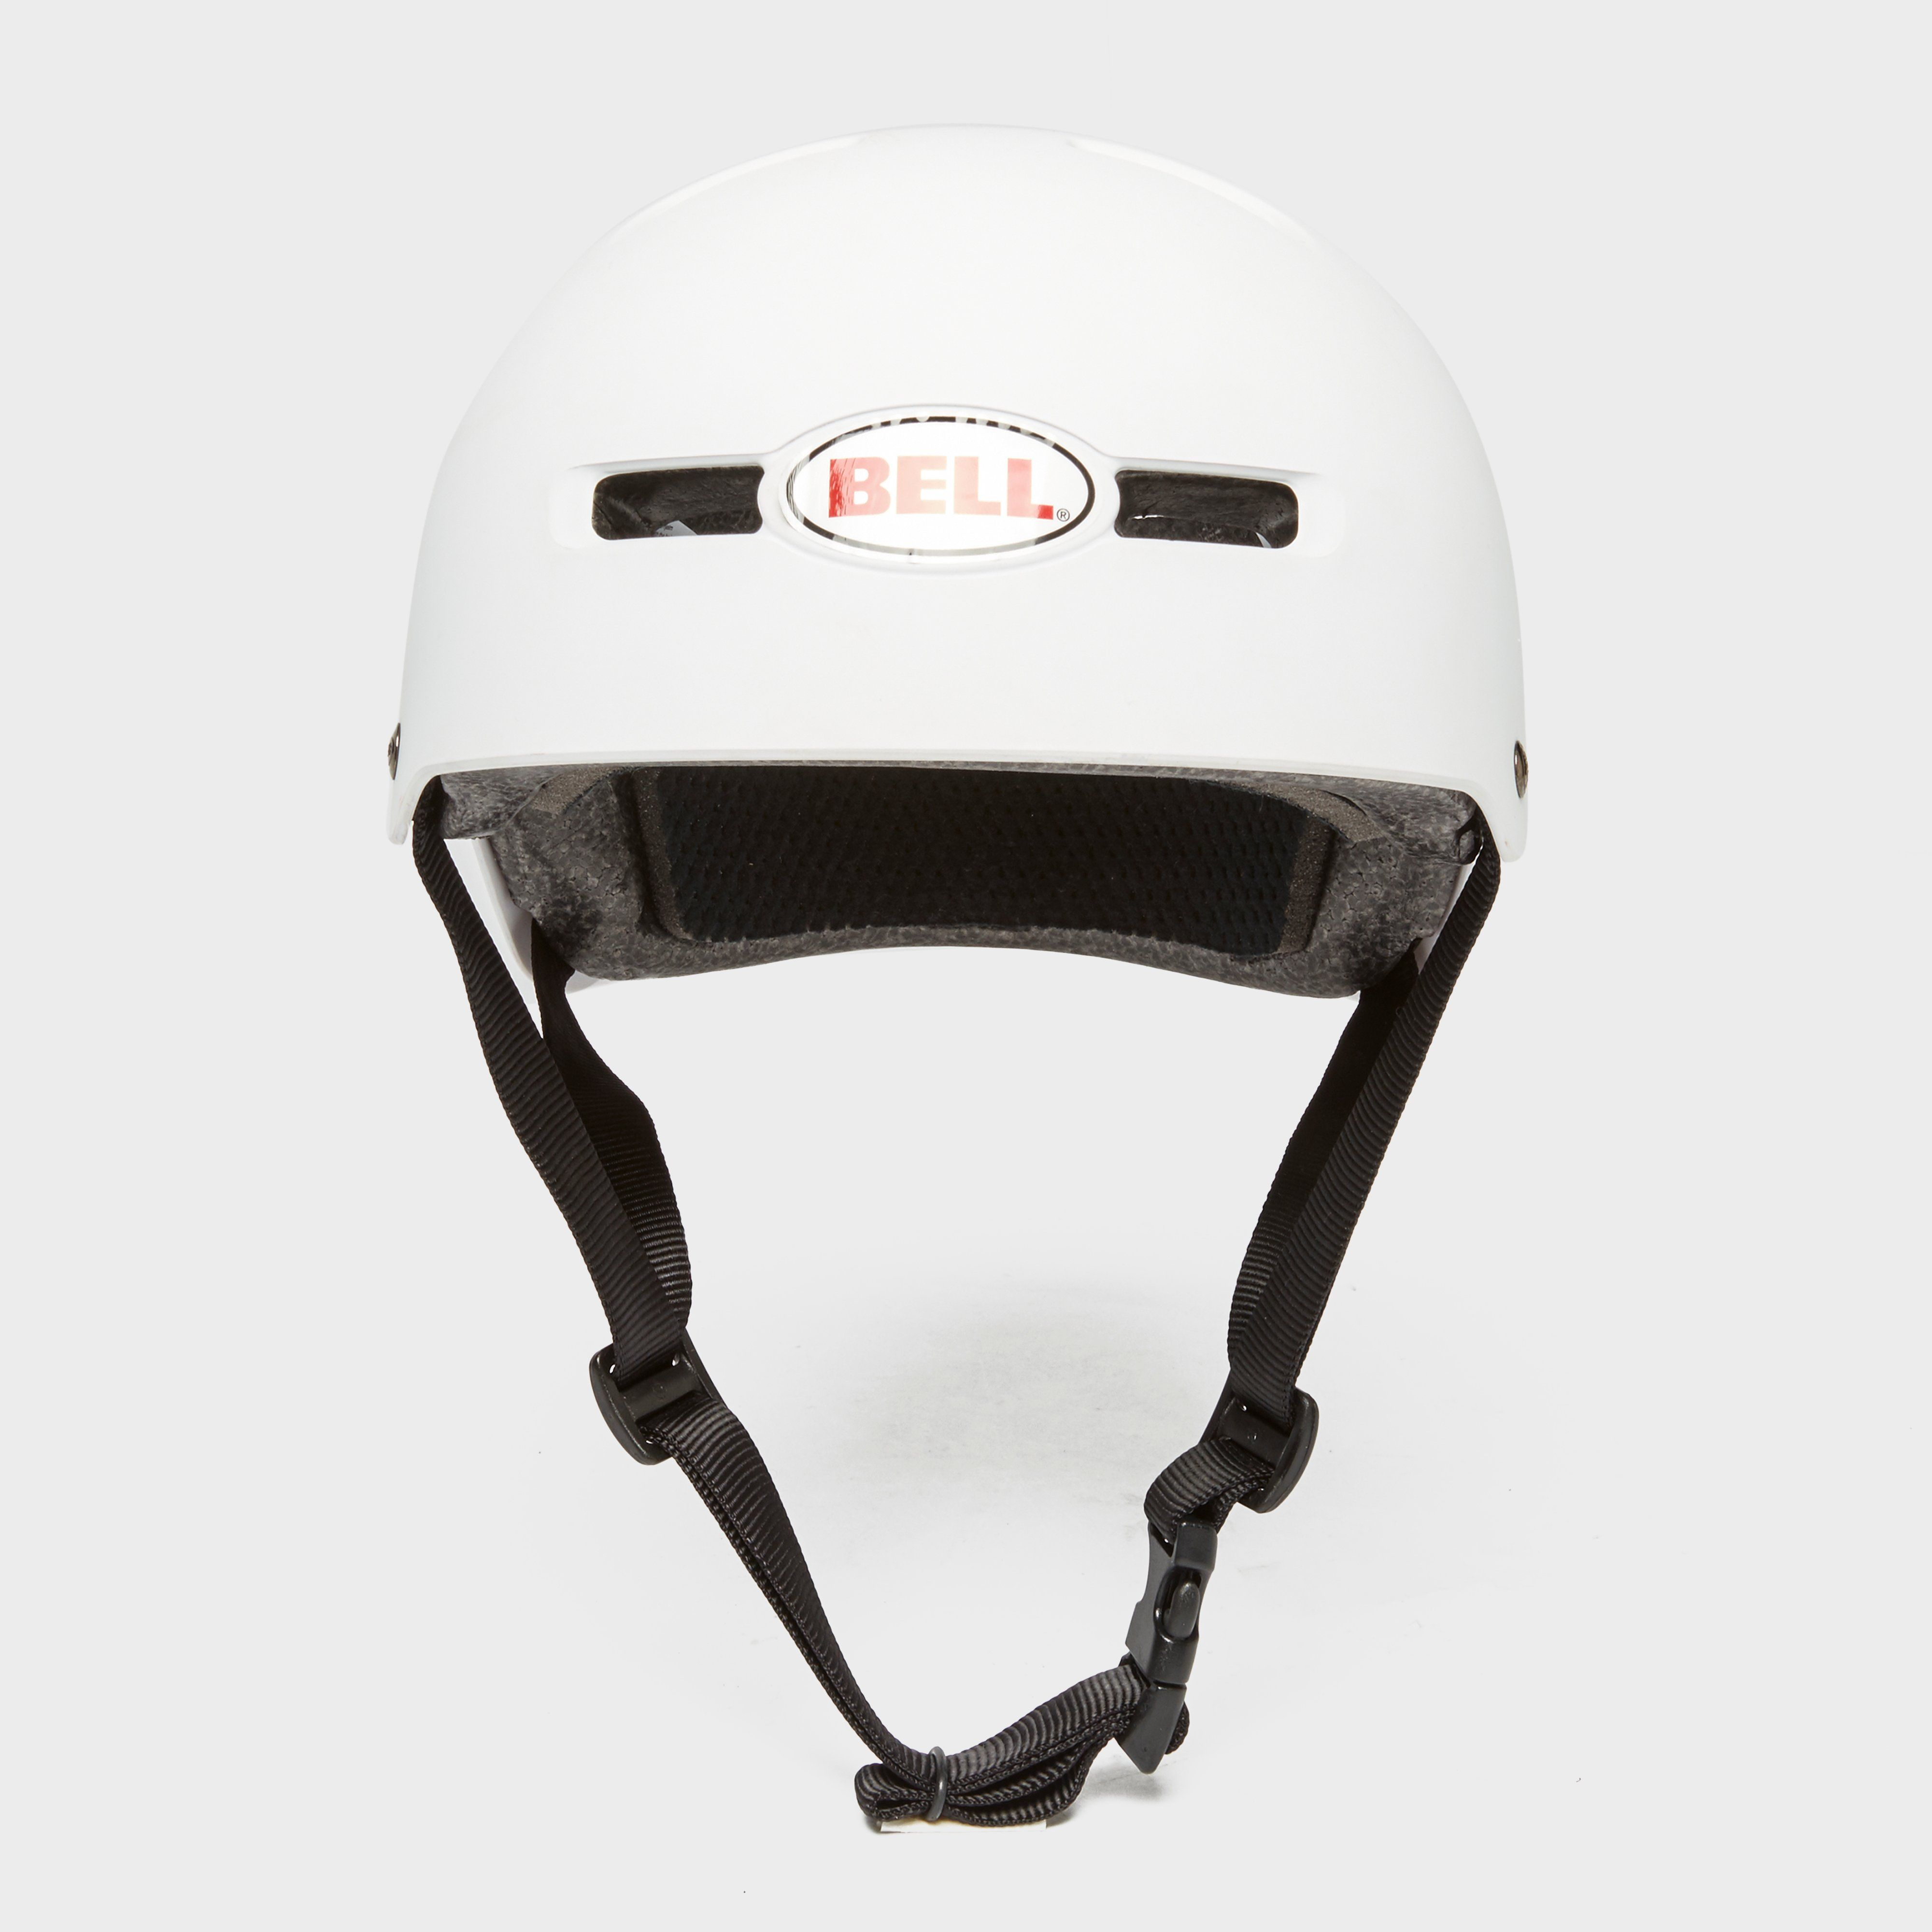 BELL Mad Fraction Y Helmet